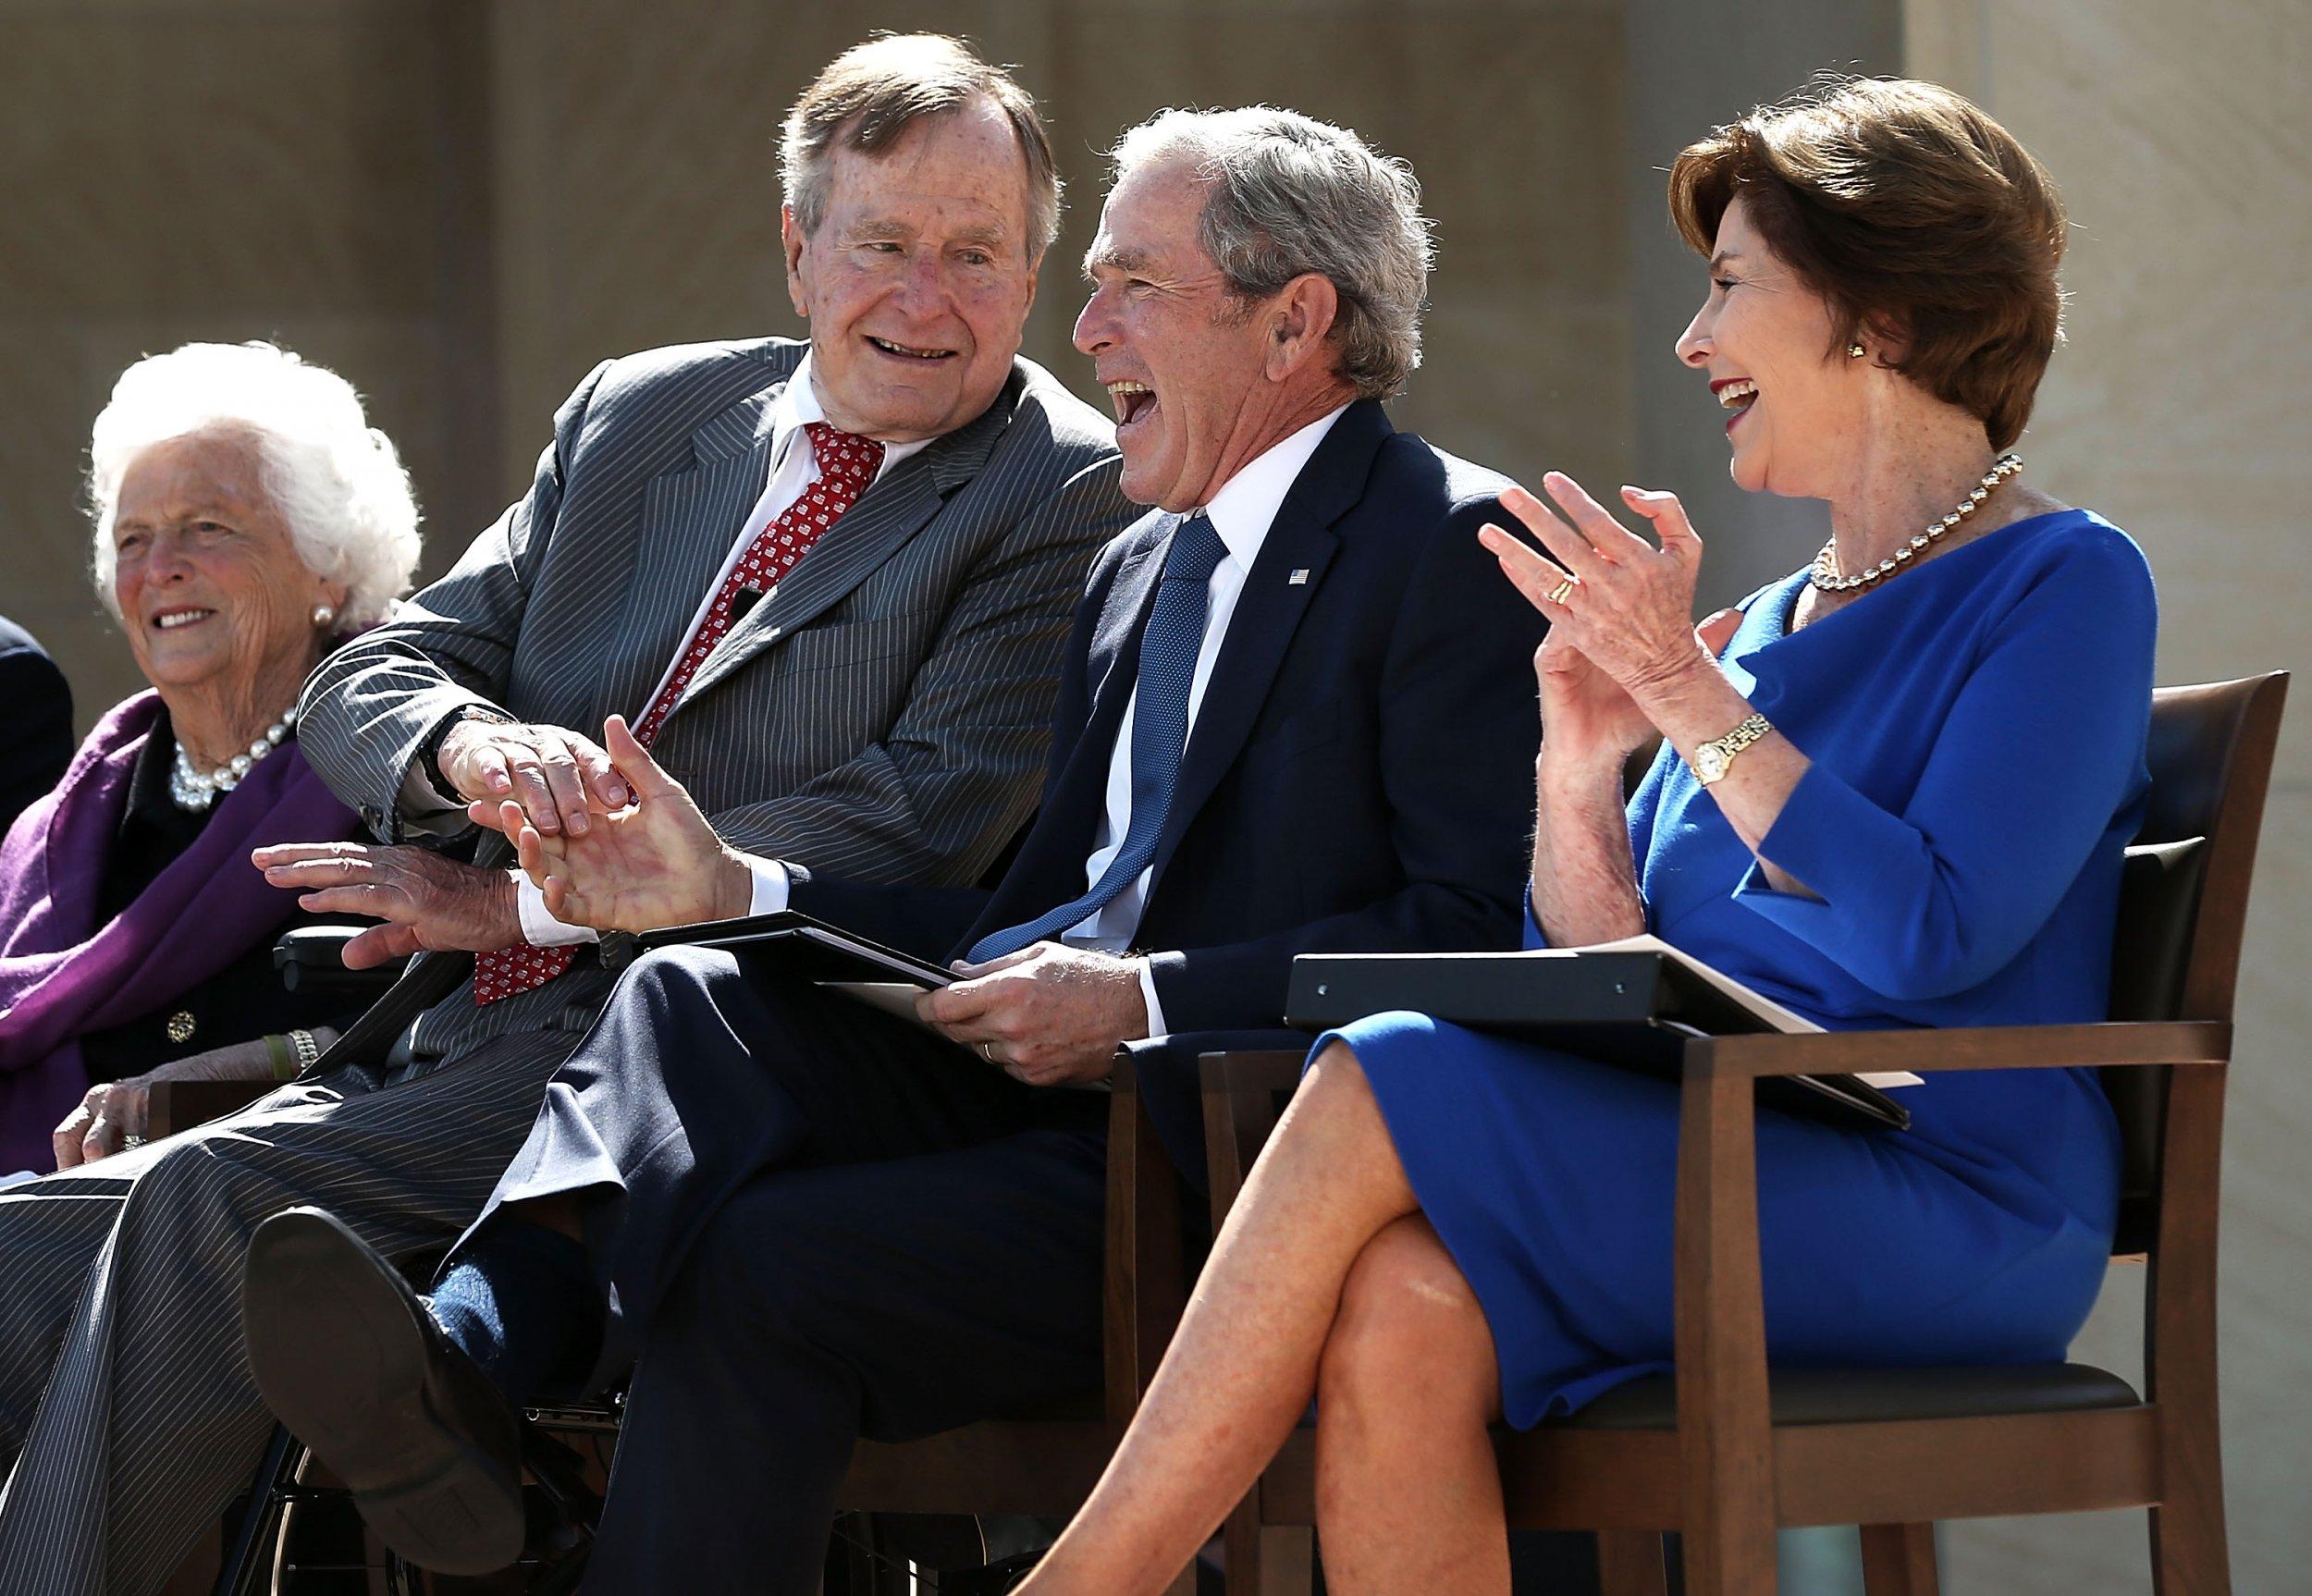 01_28_Bush_Trump_01